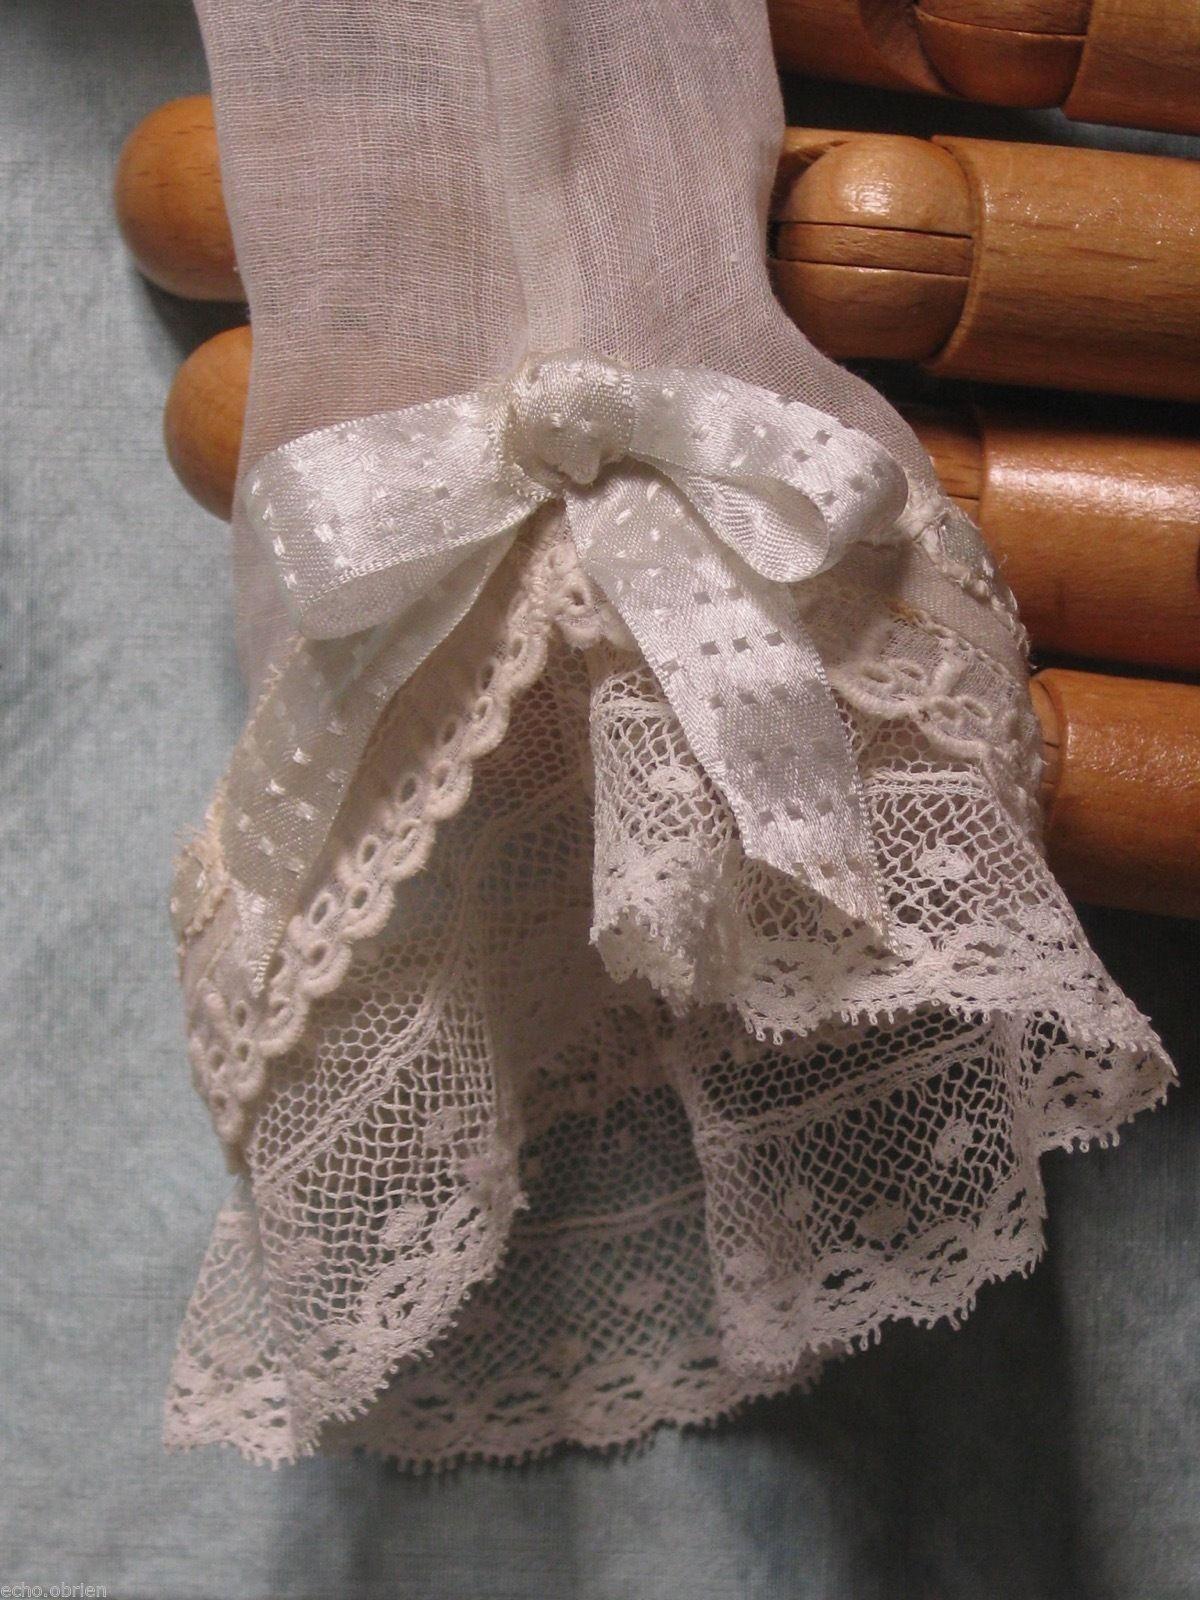 "Antique Sheer Cotton Enfantine French Fashion Blouse 16 18"" Doll Poupee Modele | eBay"